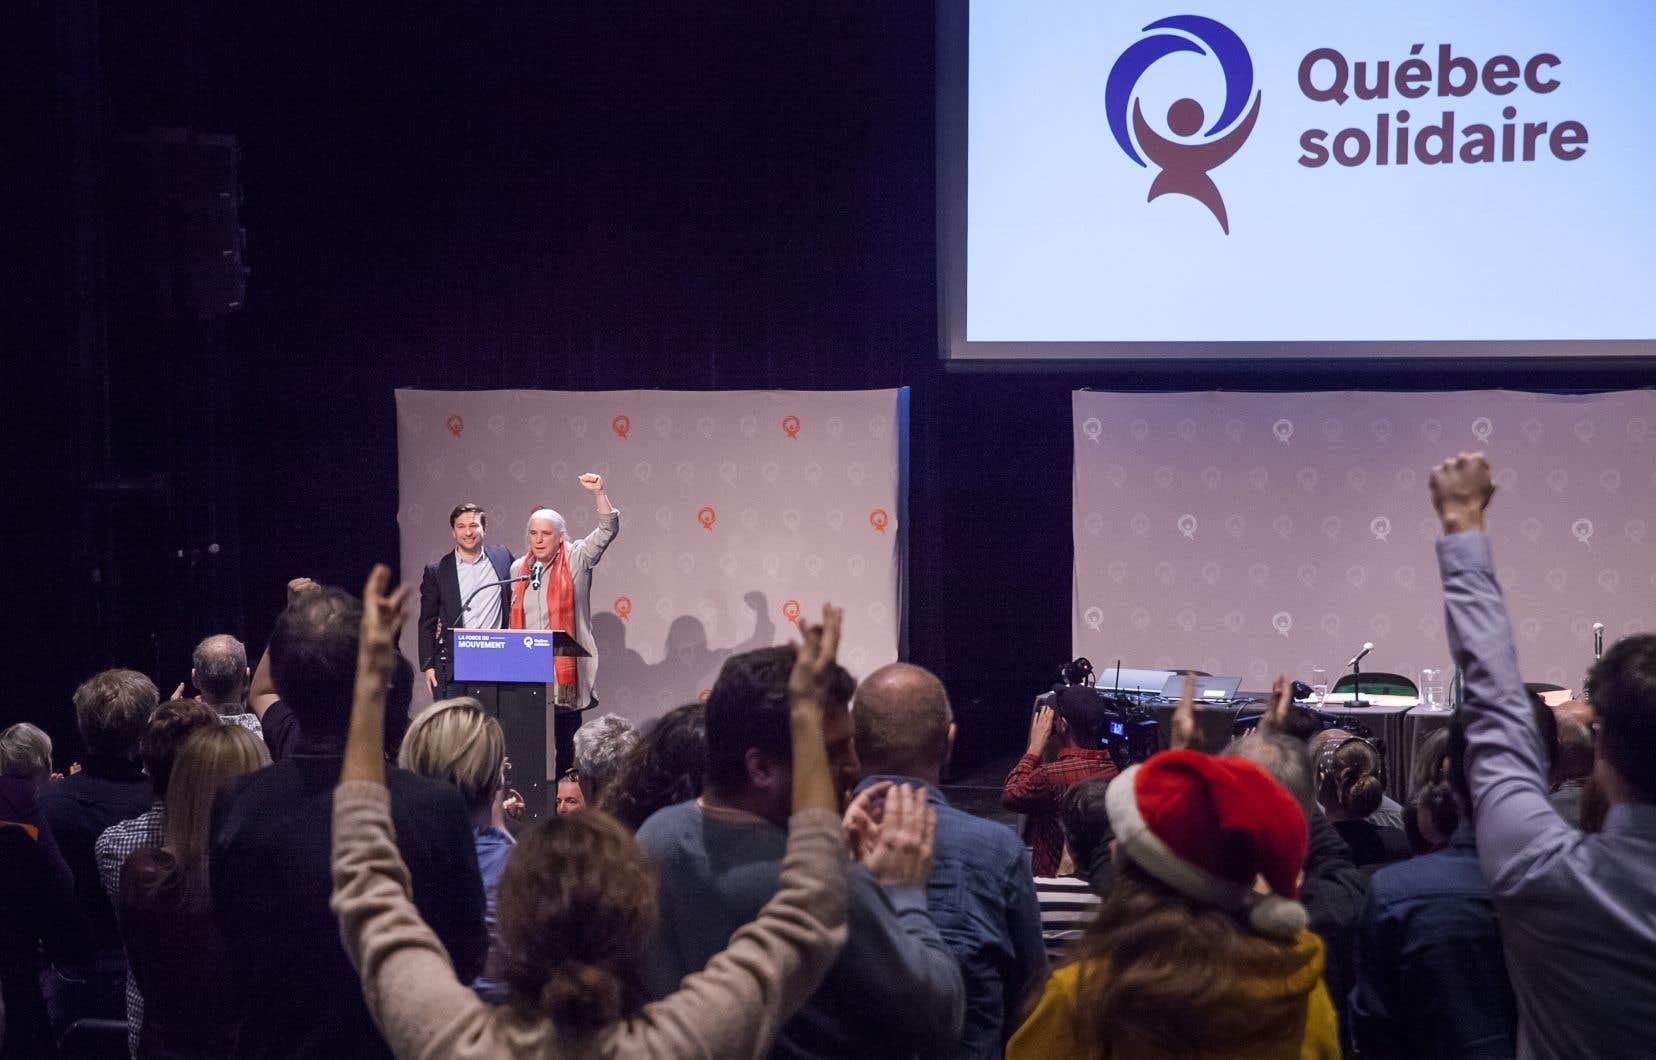 La députation de Québec solidaire a accueilli favorablement l'initiative.